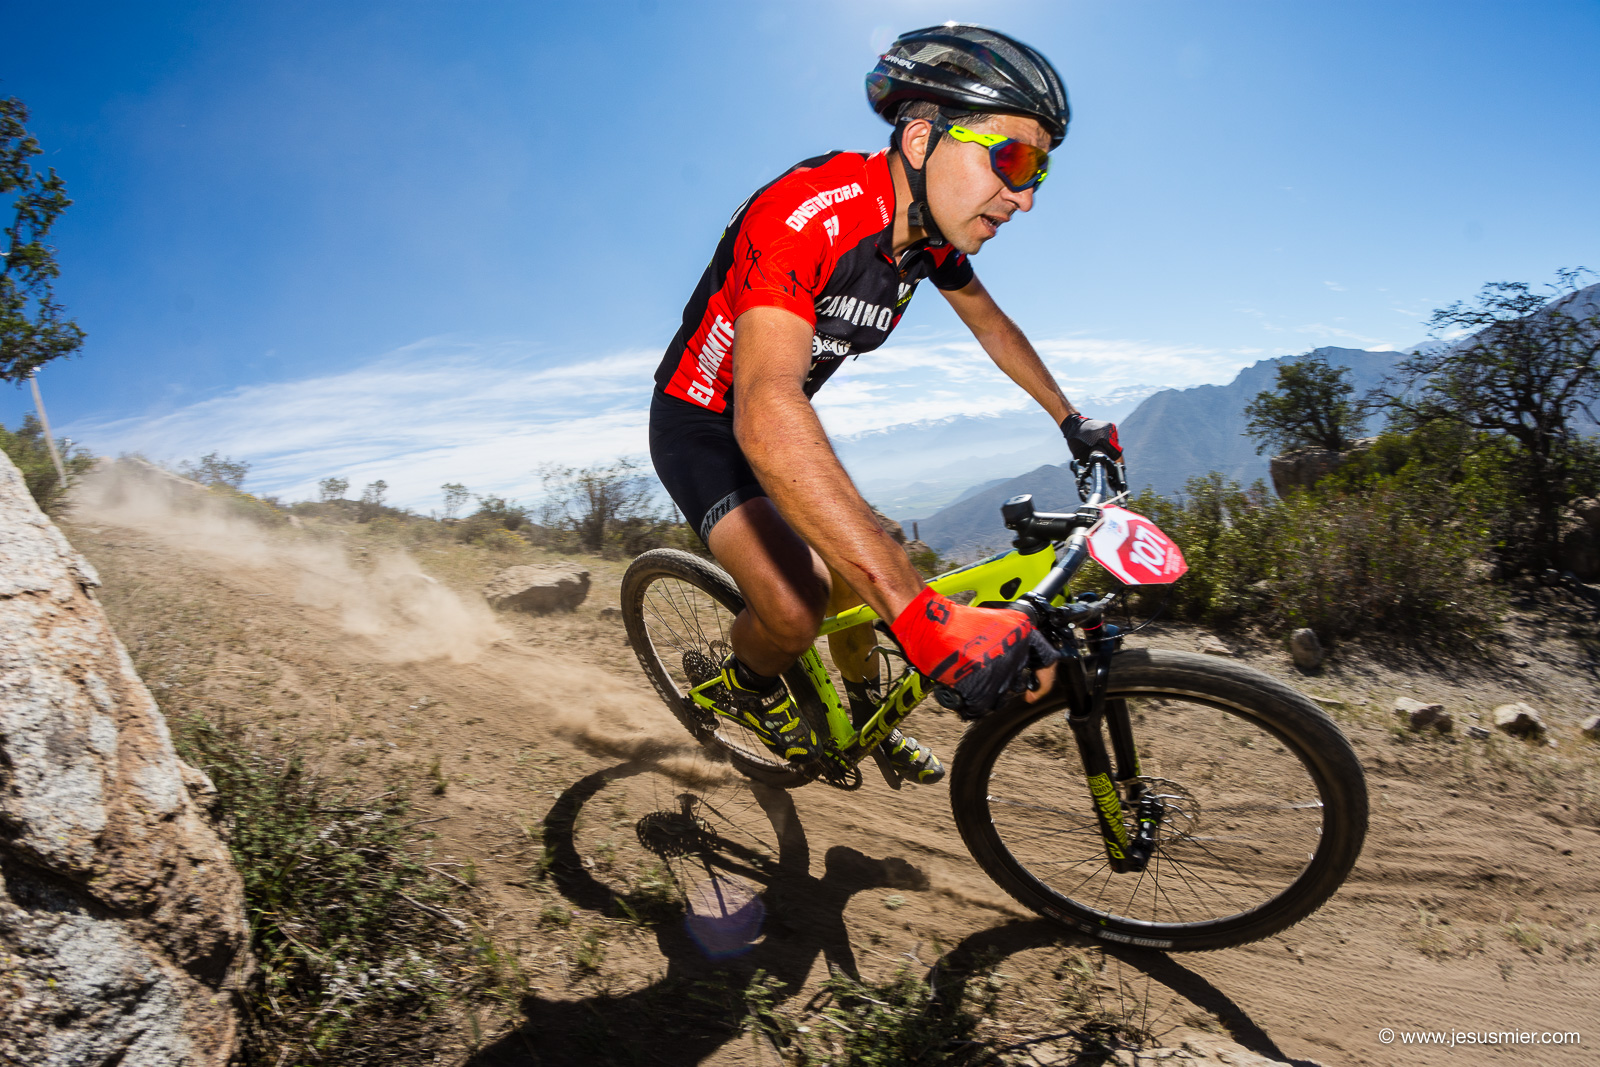 uzuki Mountainbike Tour 2018, Los Andes. Foto: Jesus Mier